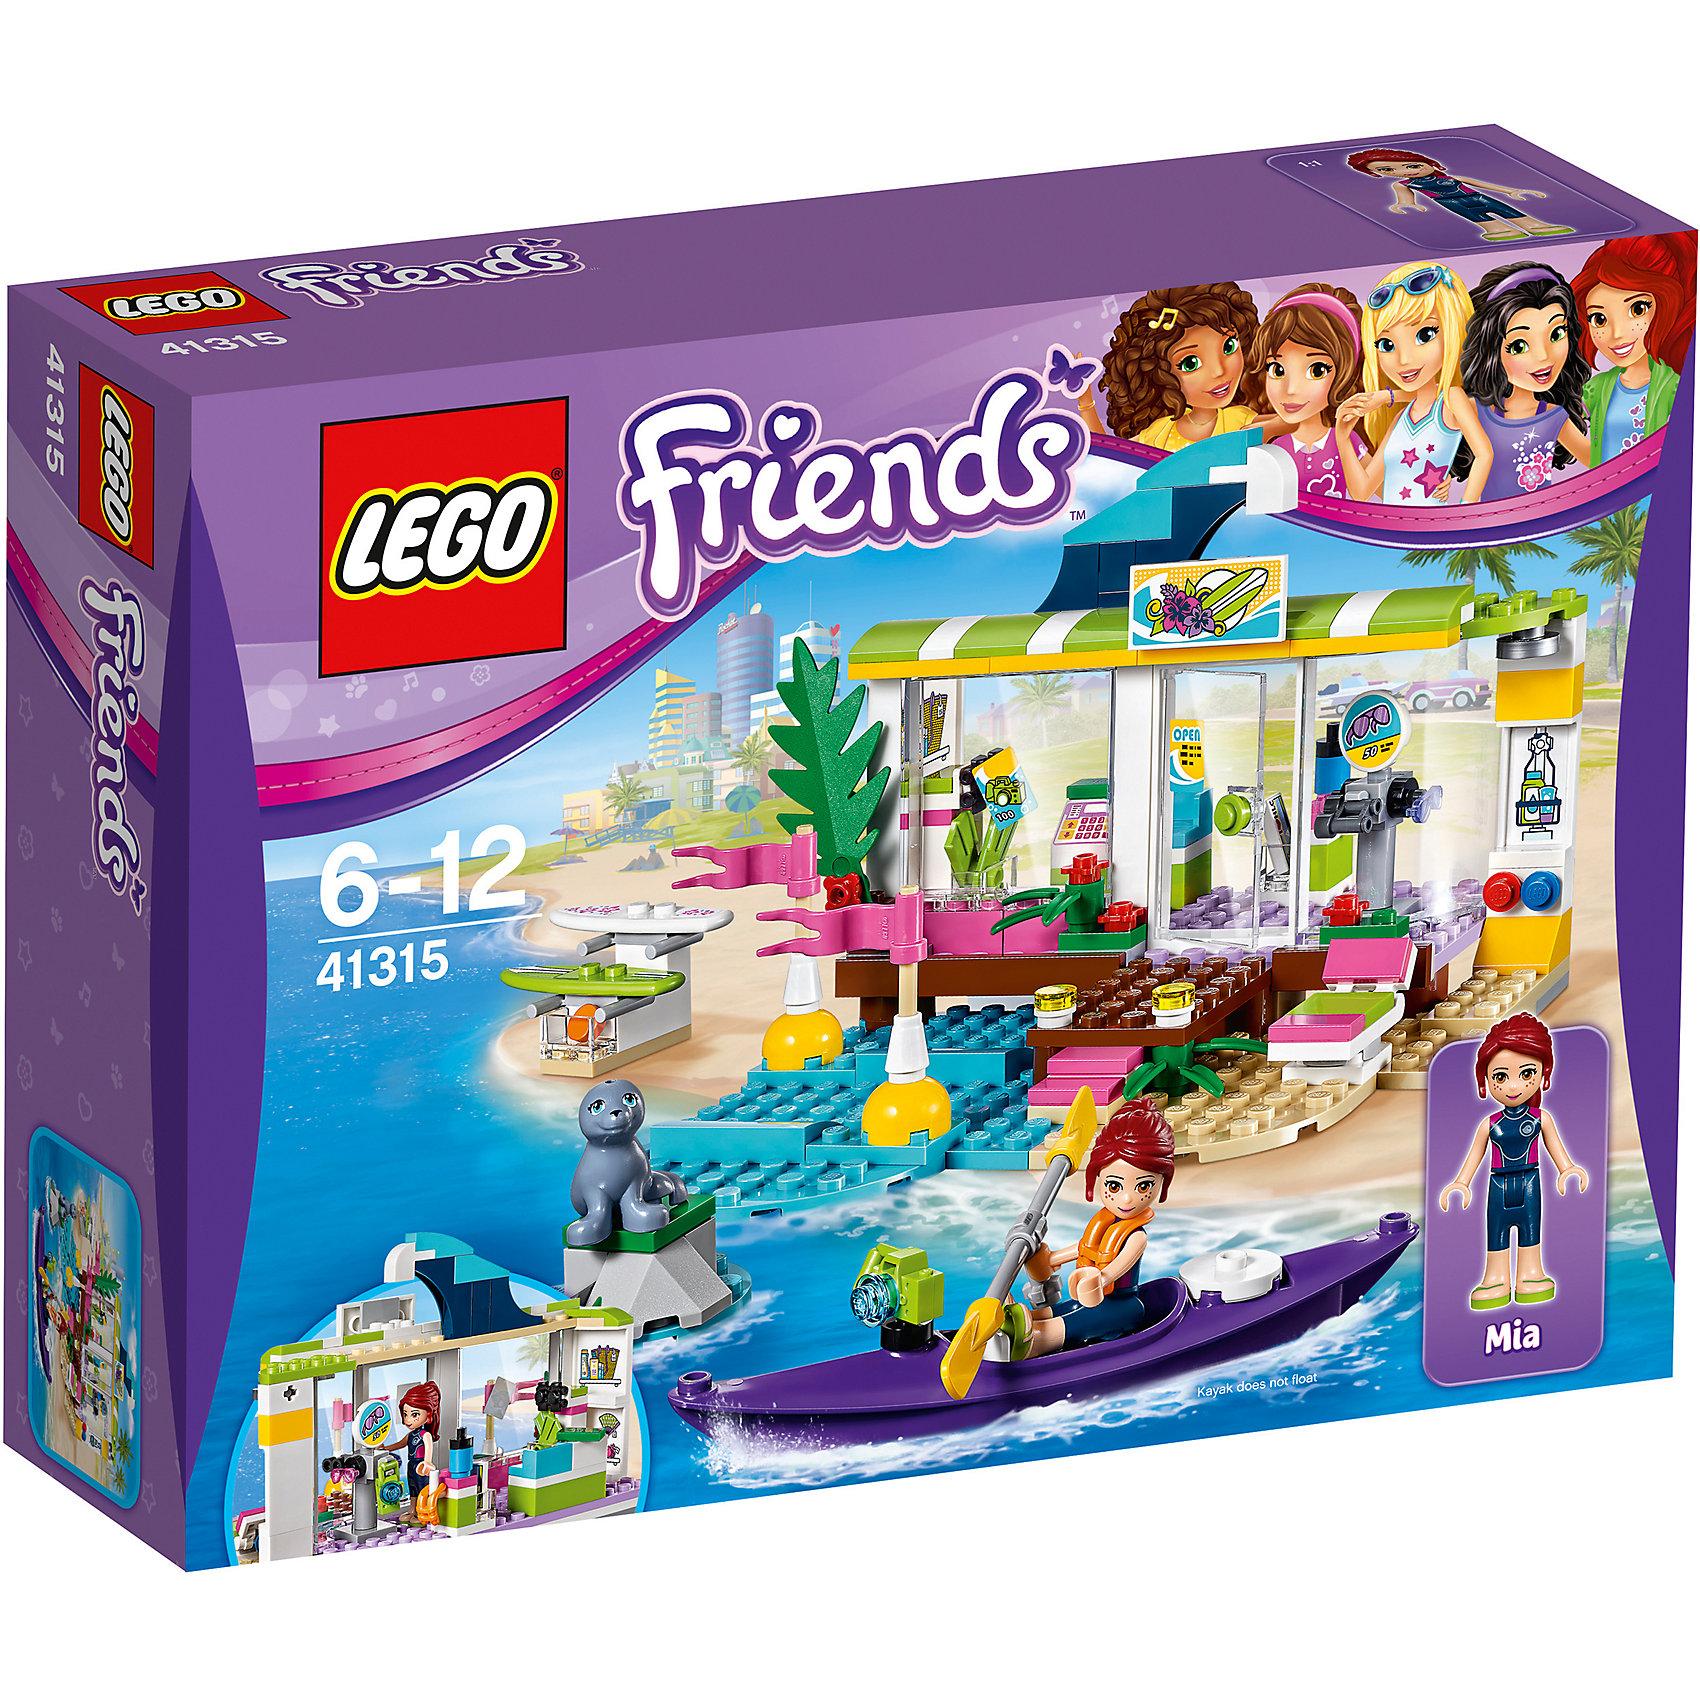 LEGO Friends 41315: Сёрф-станцияПластмассовые конструкторы<br><br><br>Ширина мм: 260<br>Глубина мм: 192<br>Высота мм: 76<br>Вес г: 358<br>Возраст от месяцев: 72<br>Возраст до месяцев: 144<br>Пол: Женский<br>Возраст: Детский<br>SKU: 5620050